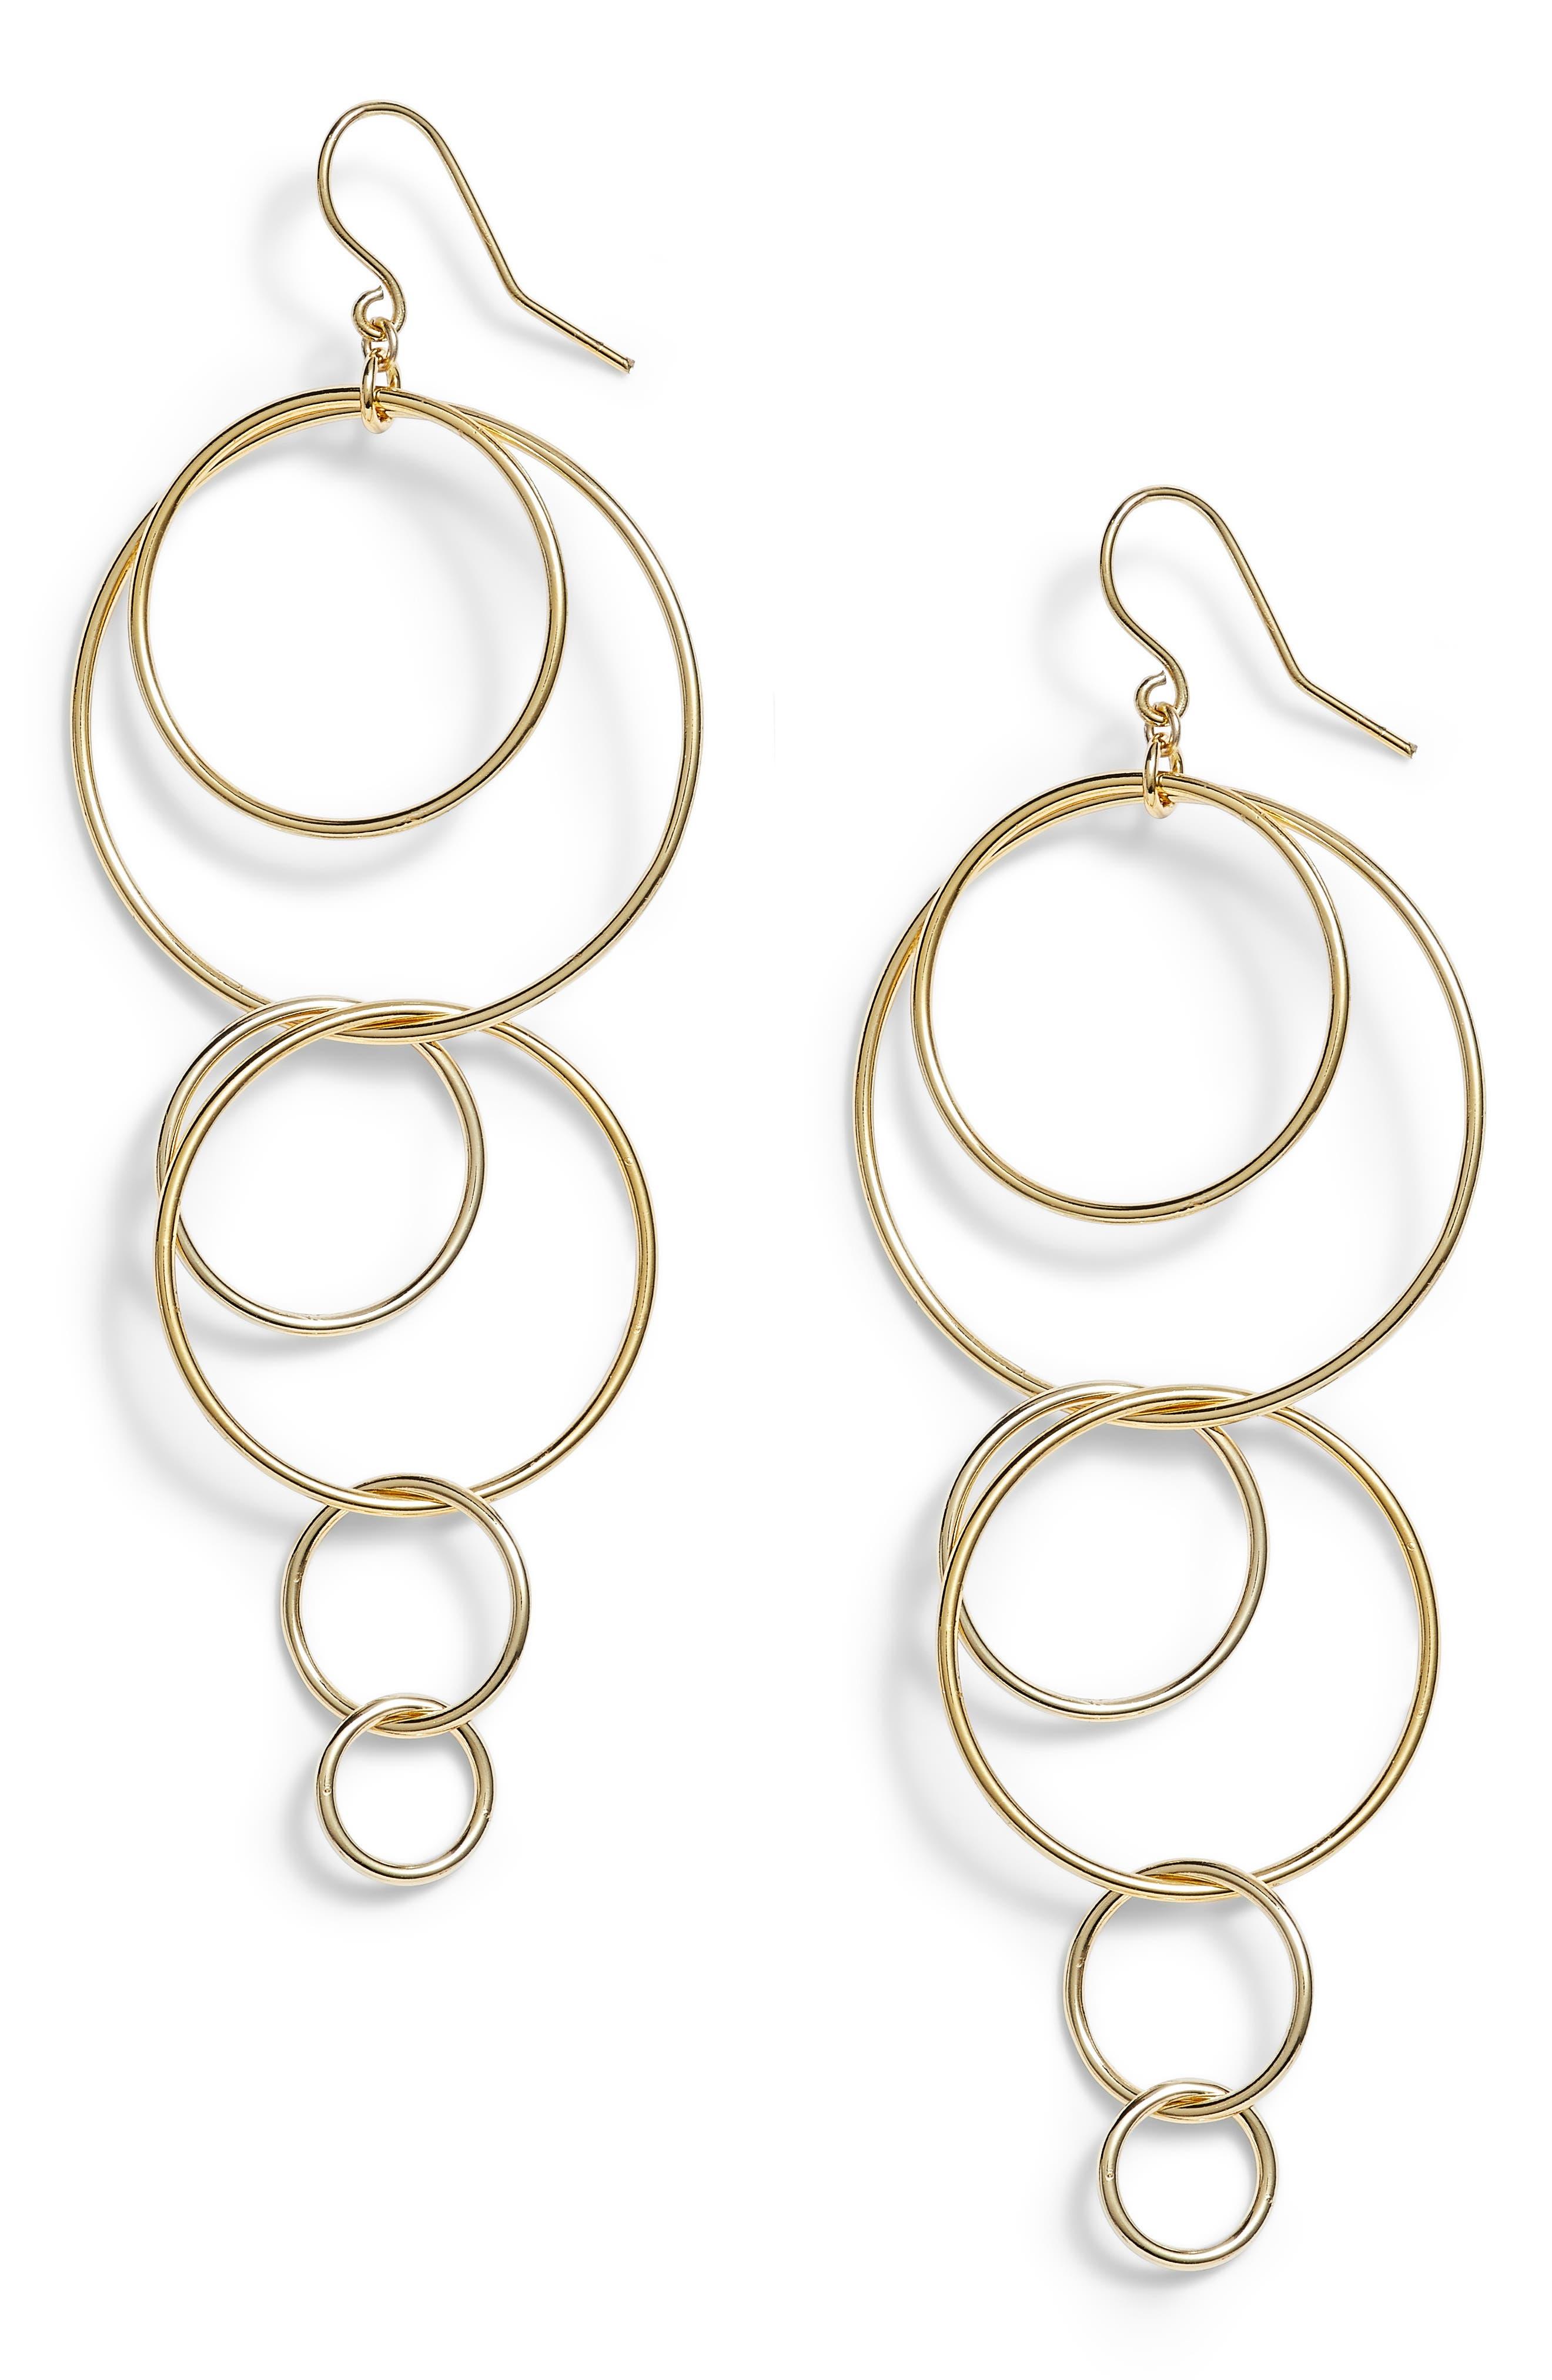 Wilshire Multi Loop Drop Earrings,                         Main,                         color, GOLD